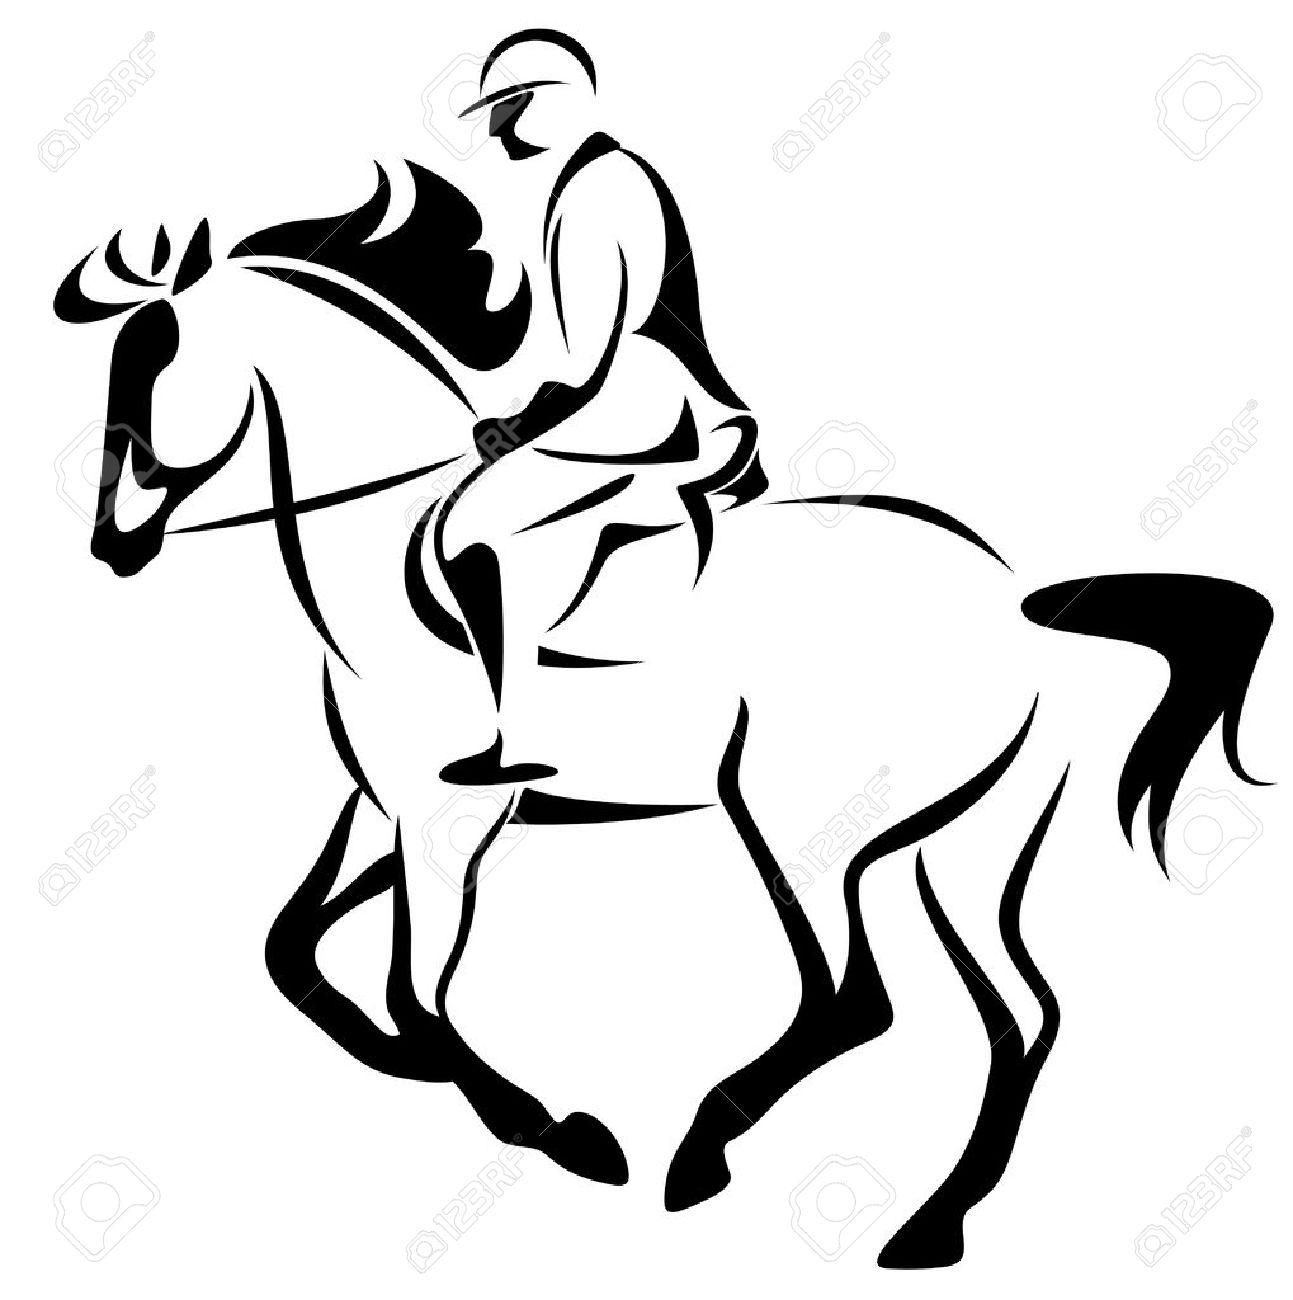 equestrian emblem horse riding illustration royalty free cliparts rh 123rf com horse riding clipart free horseback riding clipart